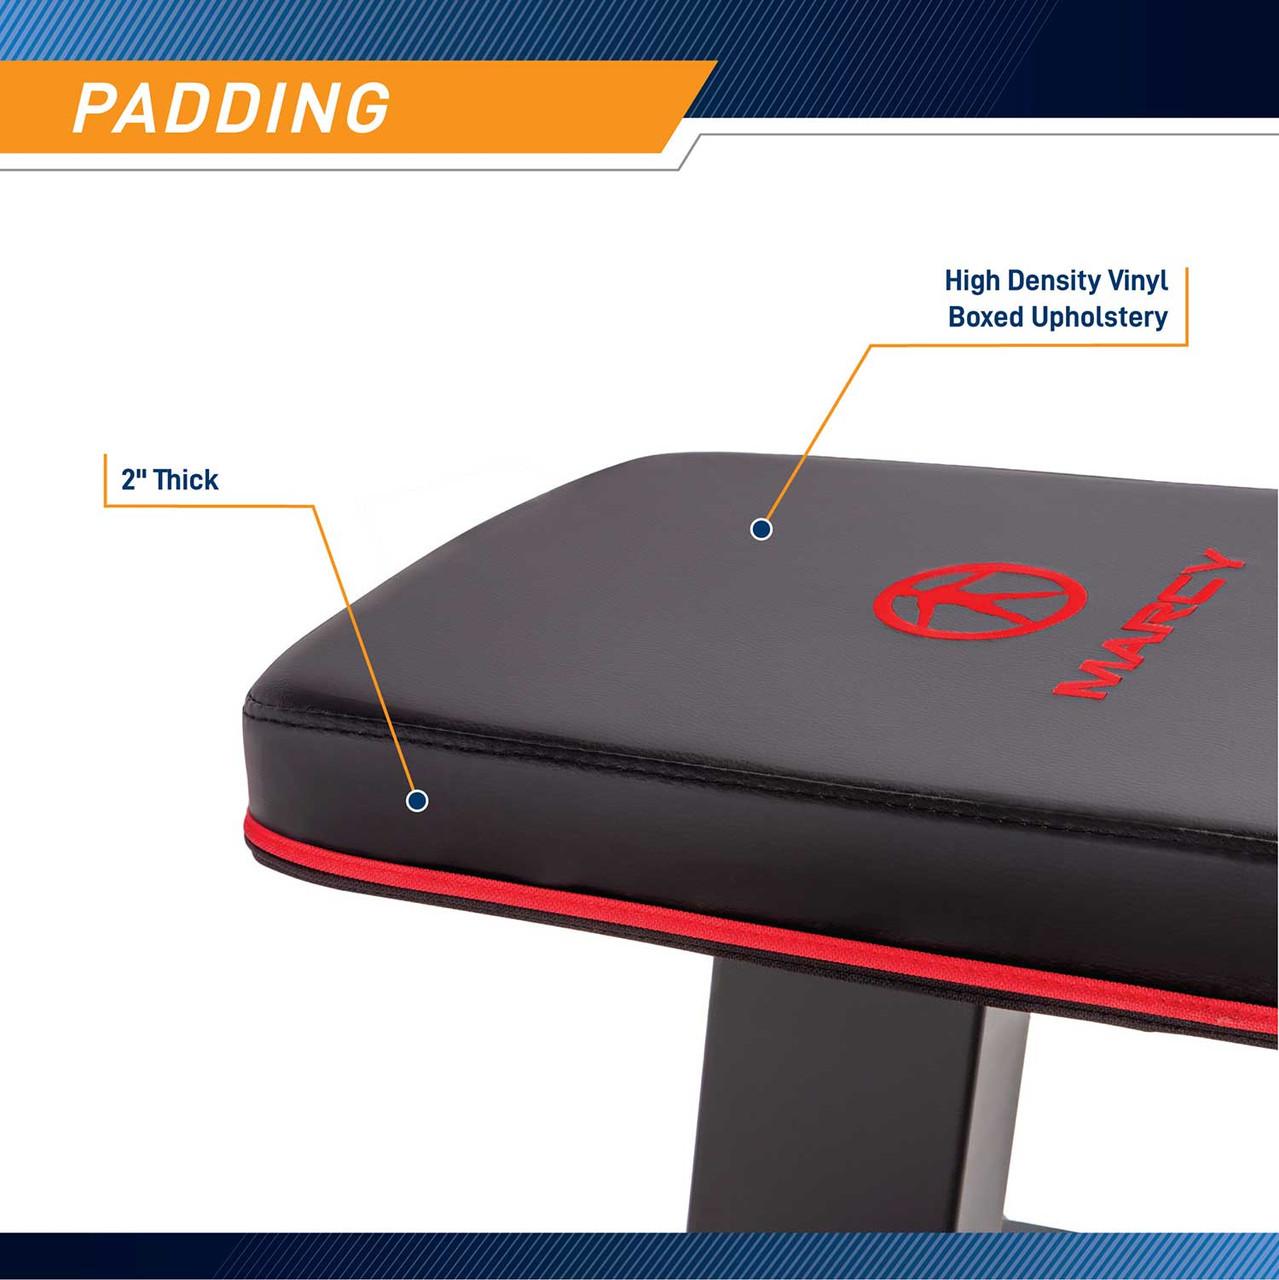 The Marcy SB-10510 Flat Bench has comfortable padding